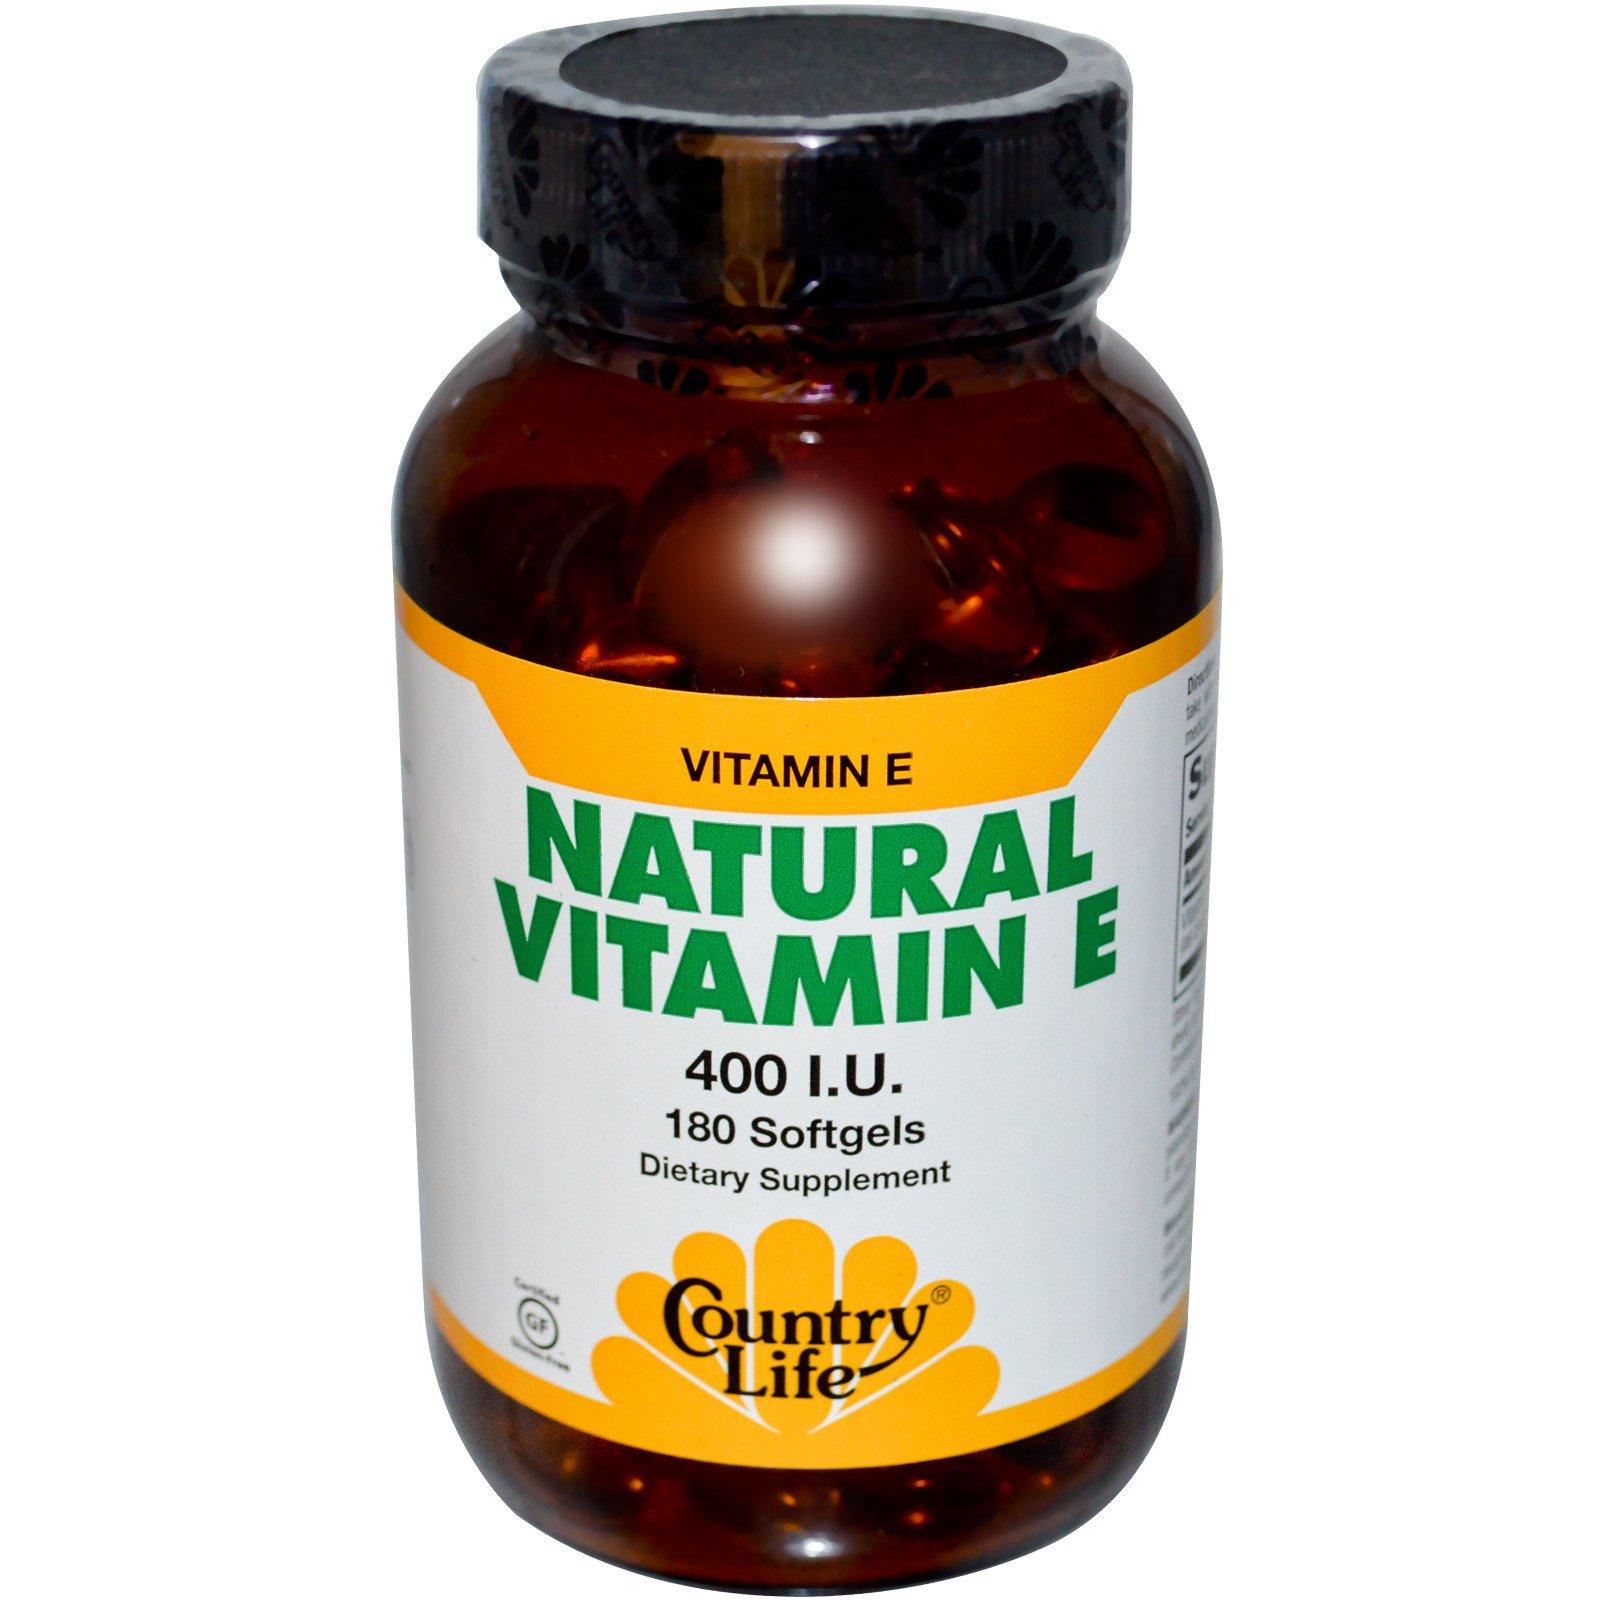 Country Life, Натуральный витамин Е, 400 МЕ, 180 гелевых капсул